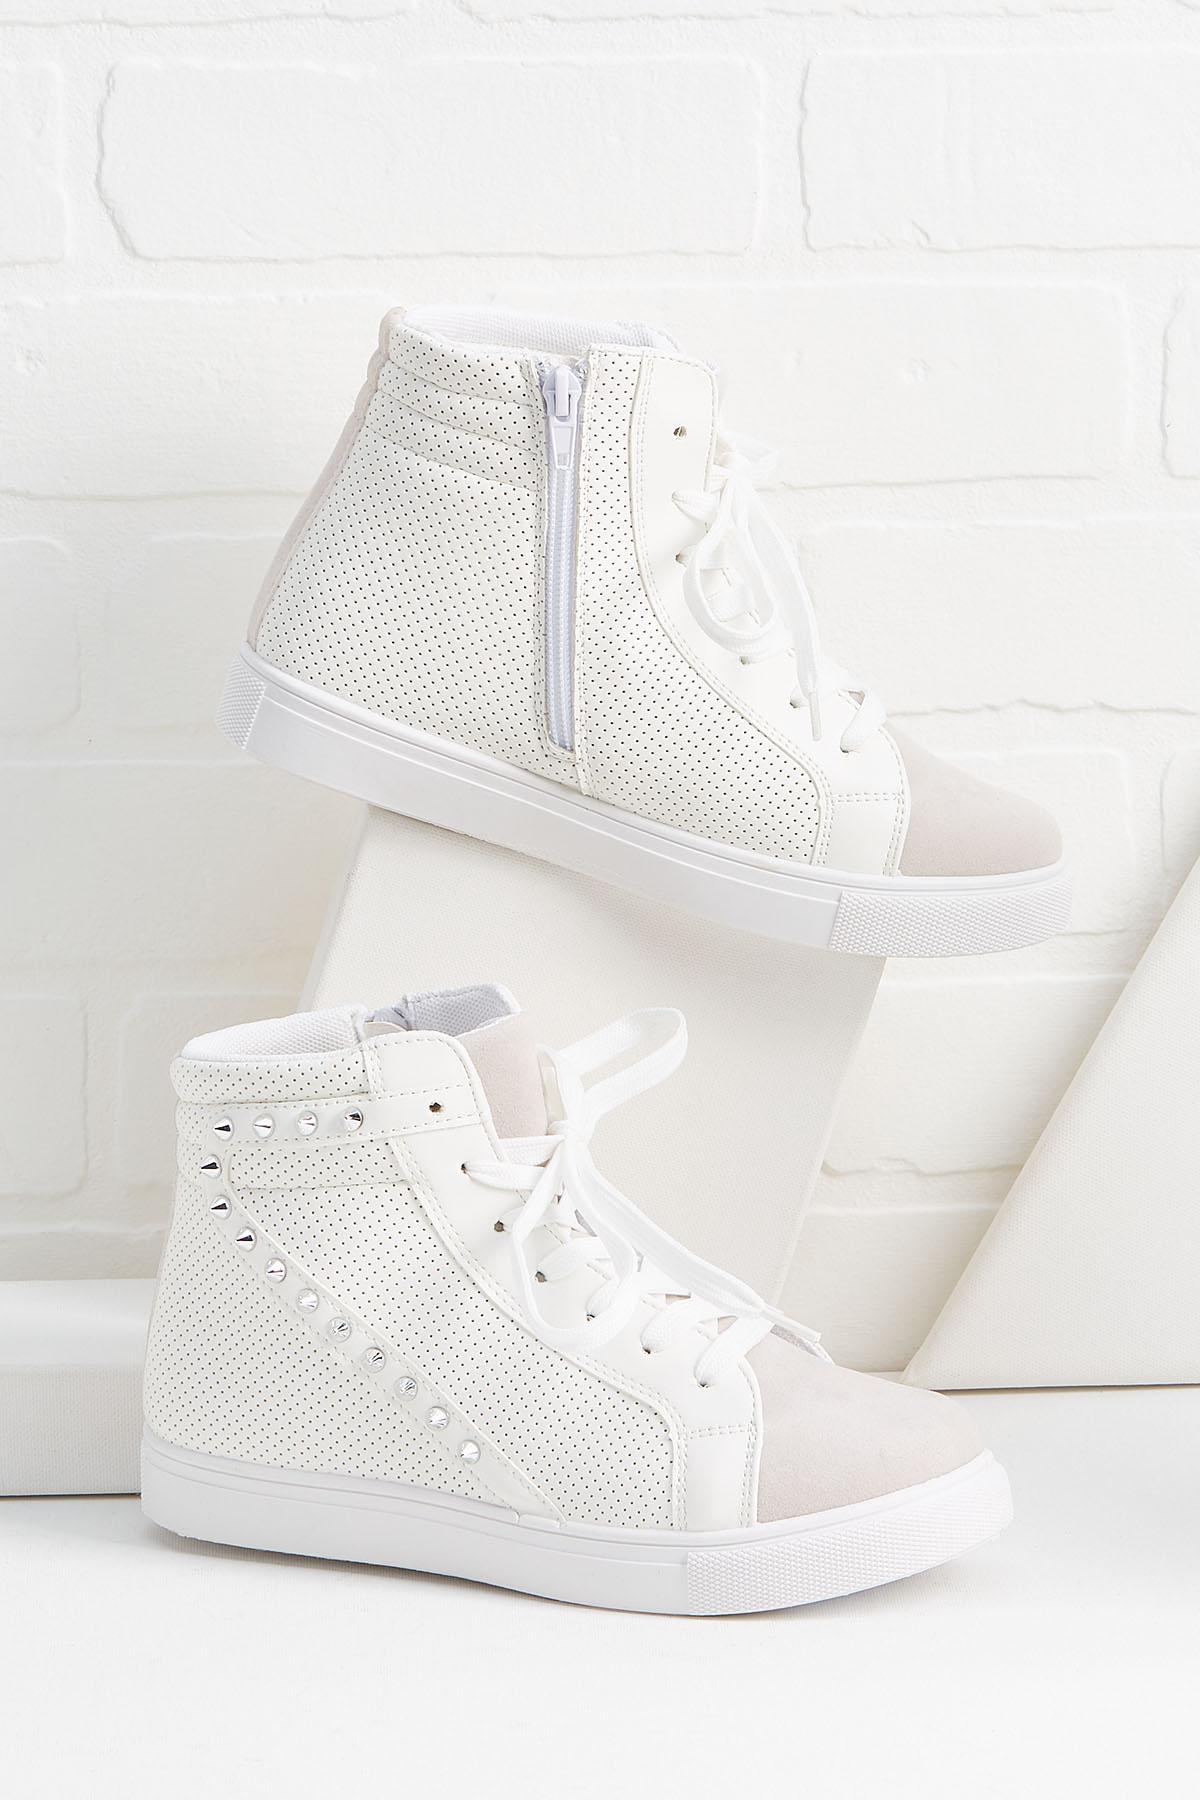 Wedge Your Way In Sneakers